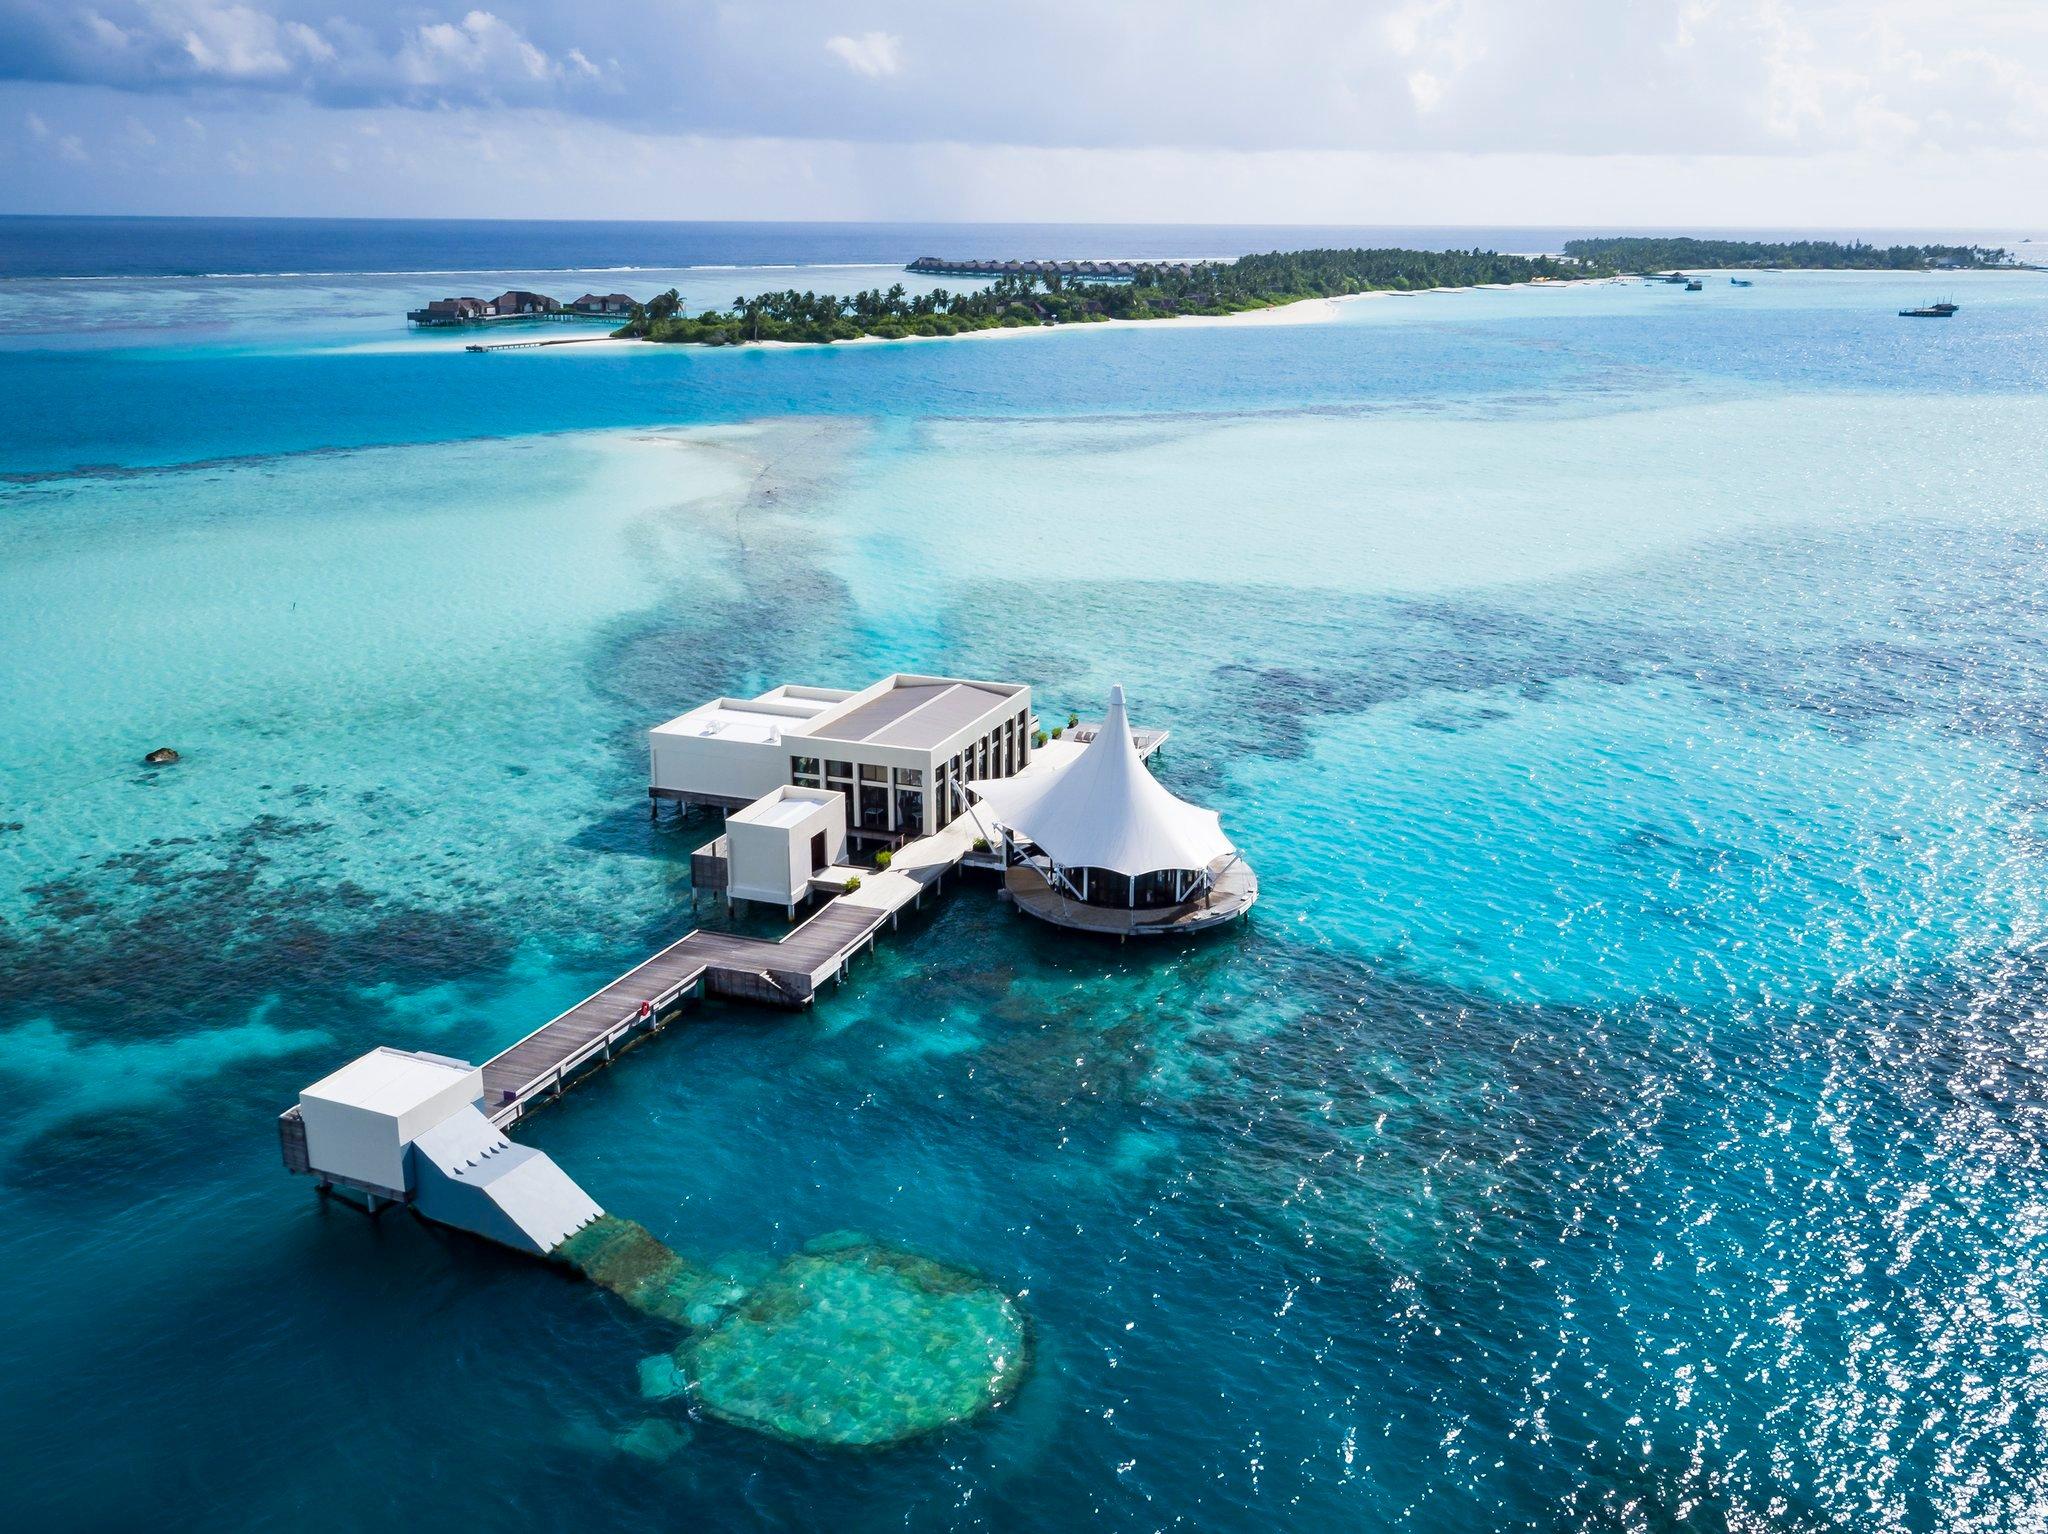 PER AQUUM Niyama Maldives